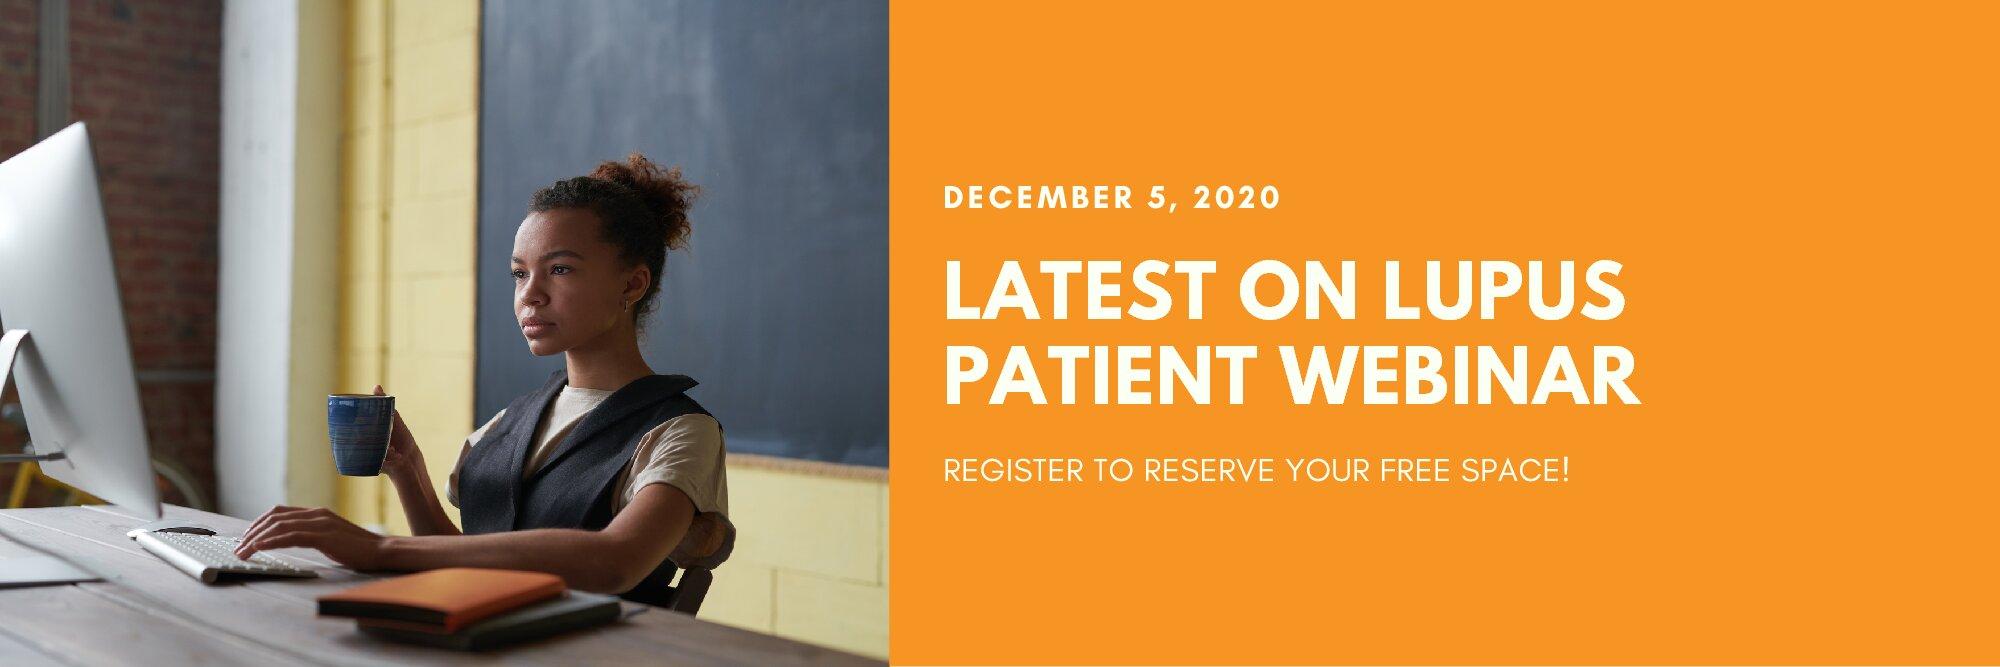 Latest on Lupus Patient Webinar | Dec. 5th